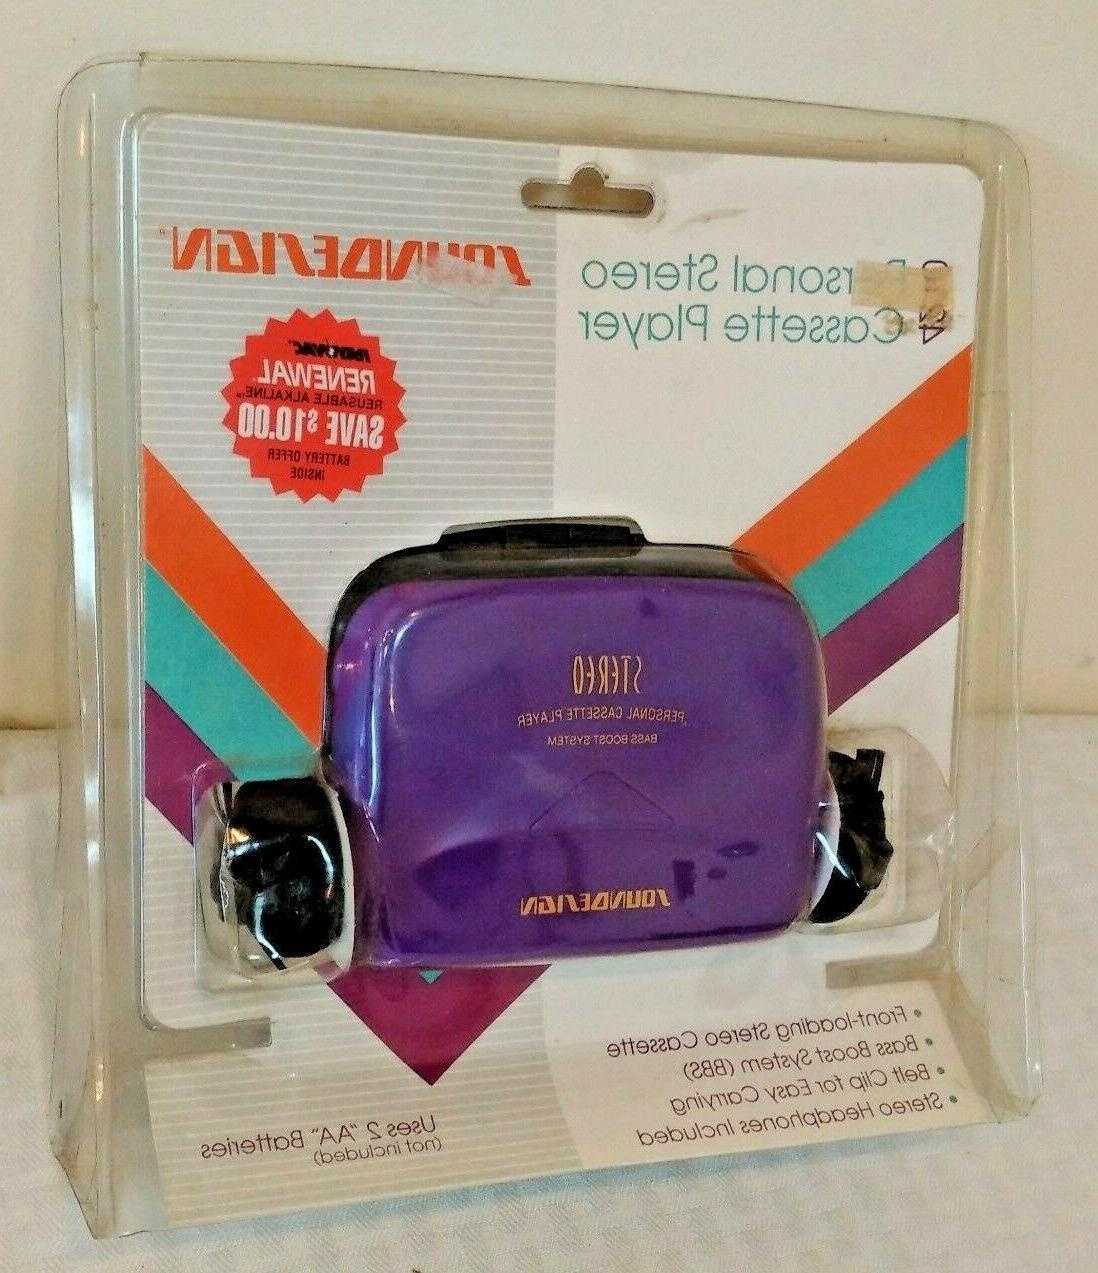 vintage 4201 personal cassette player headphones purple